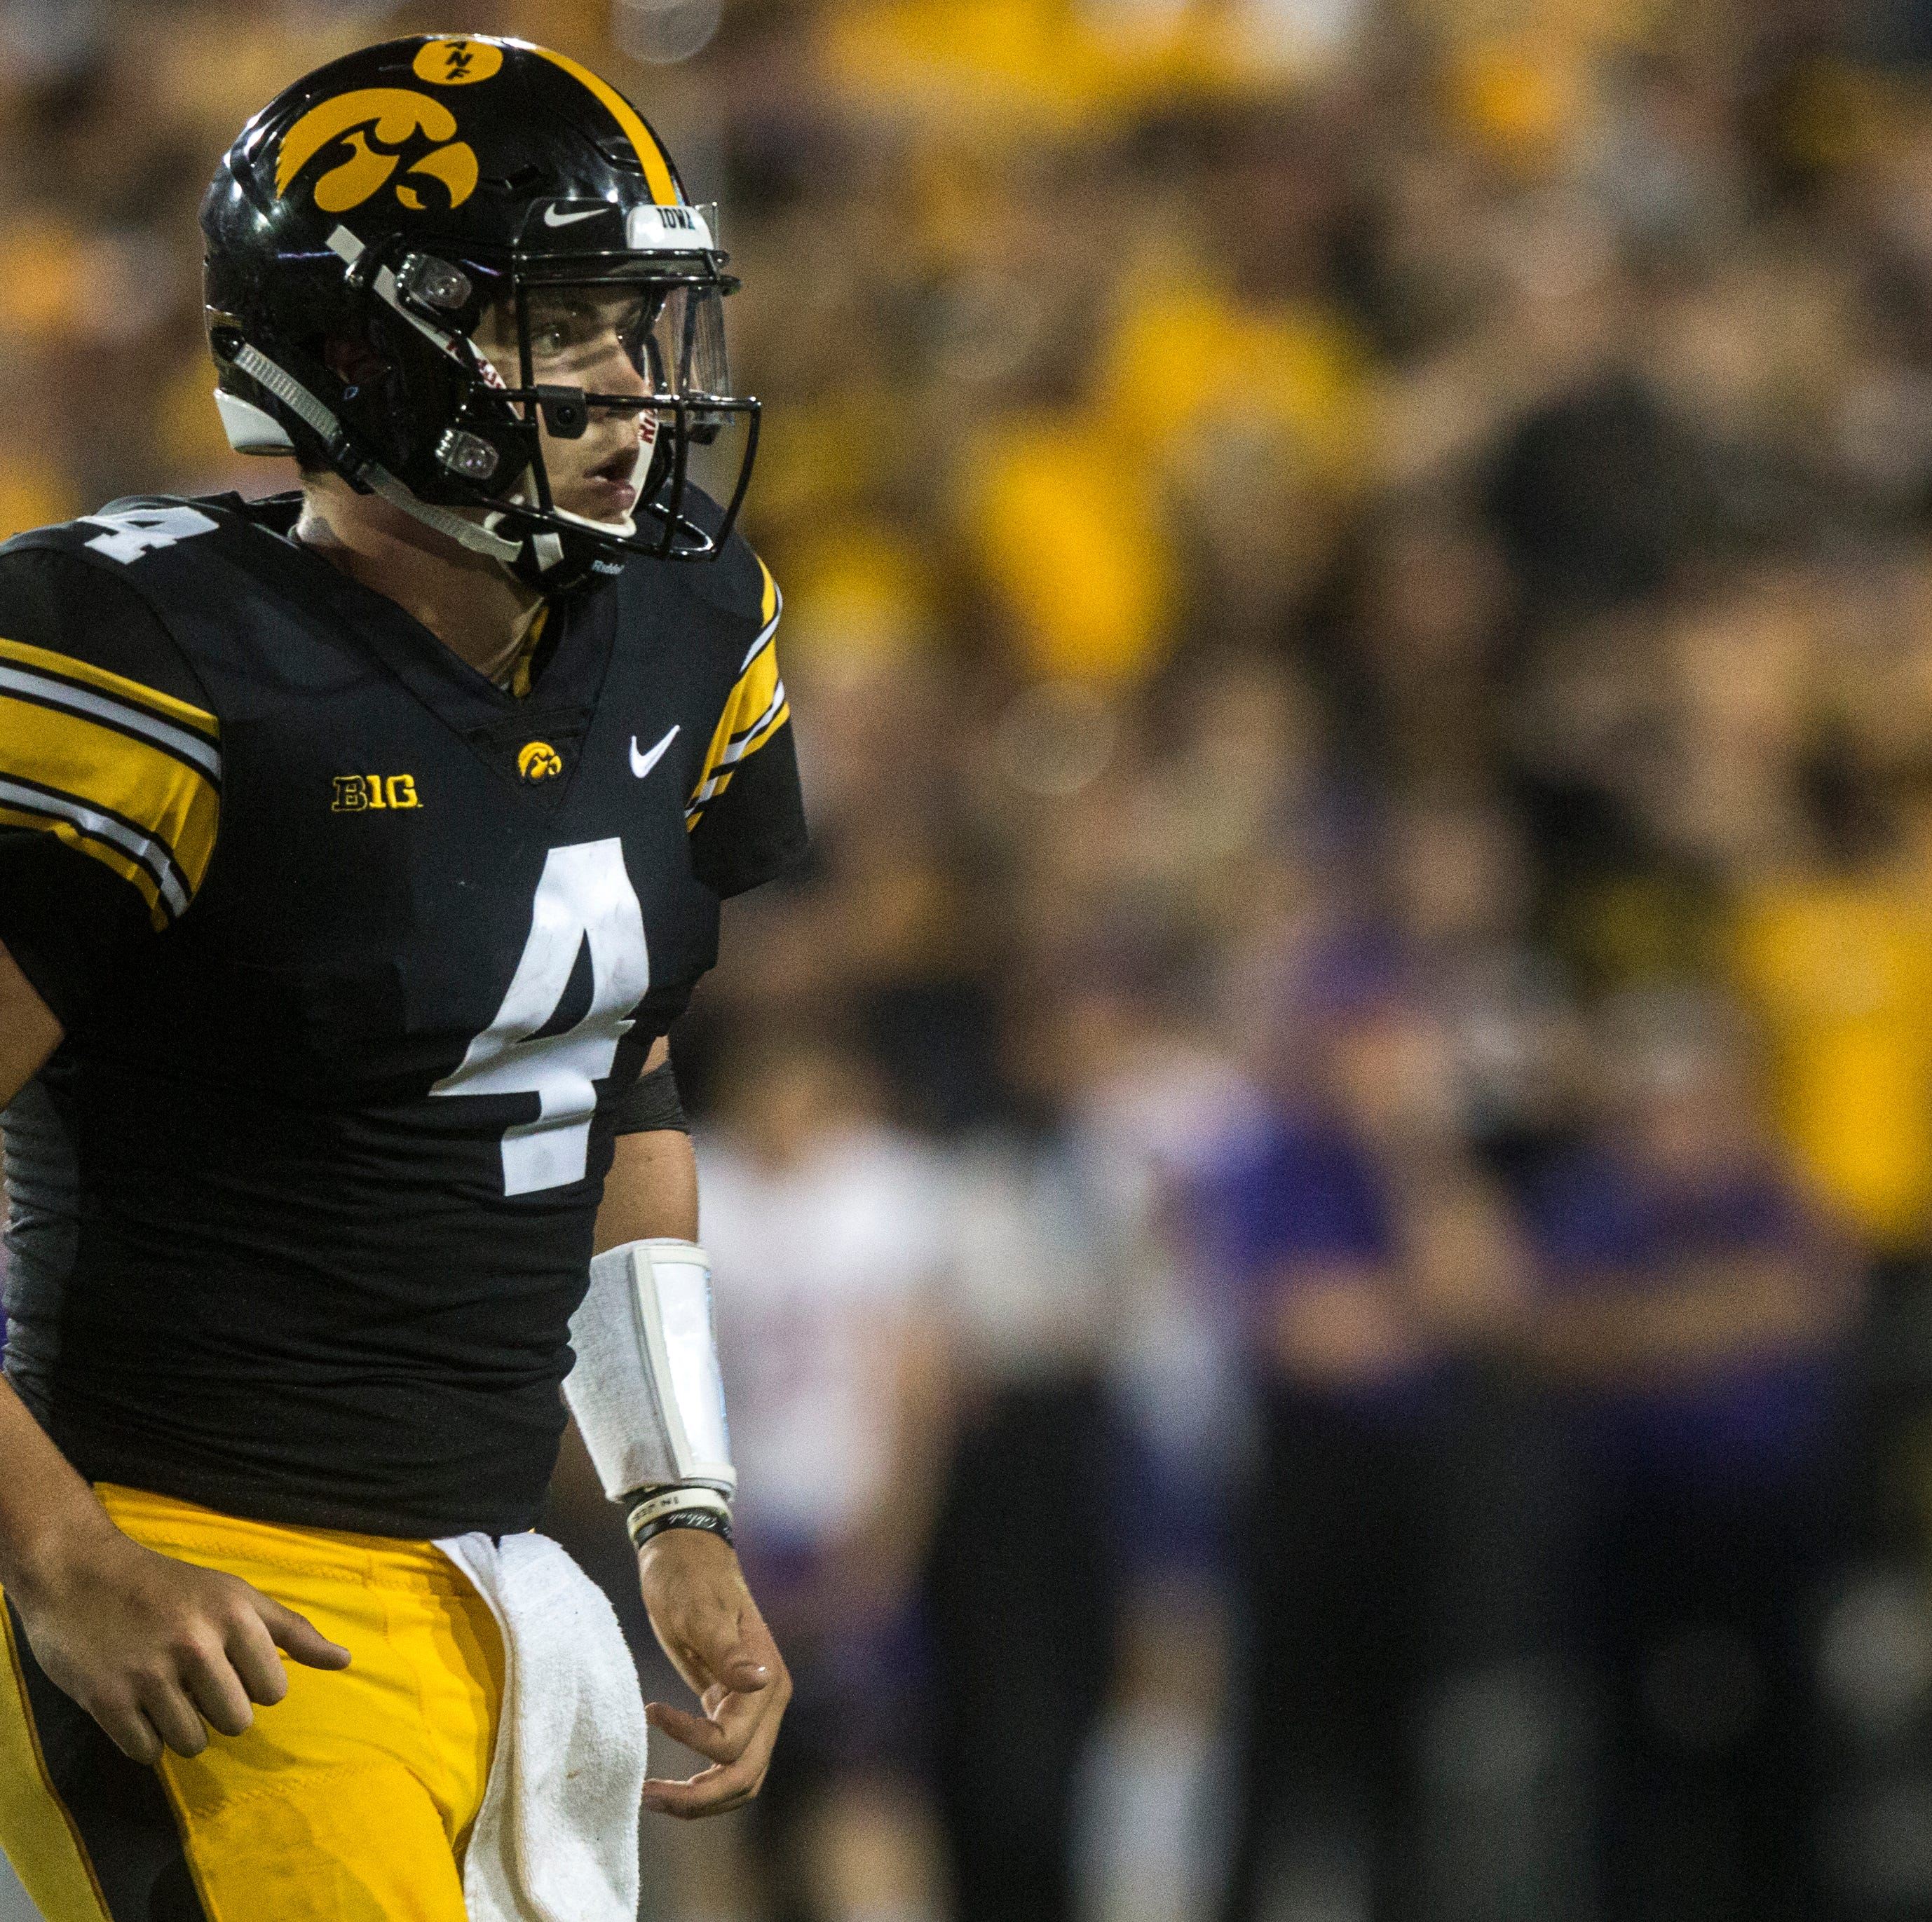 Iowa football: Hawkeyes vs. No. 16 Wisconsin live updates and analysis